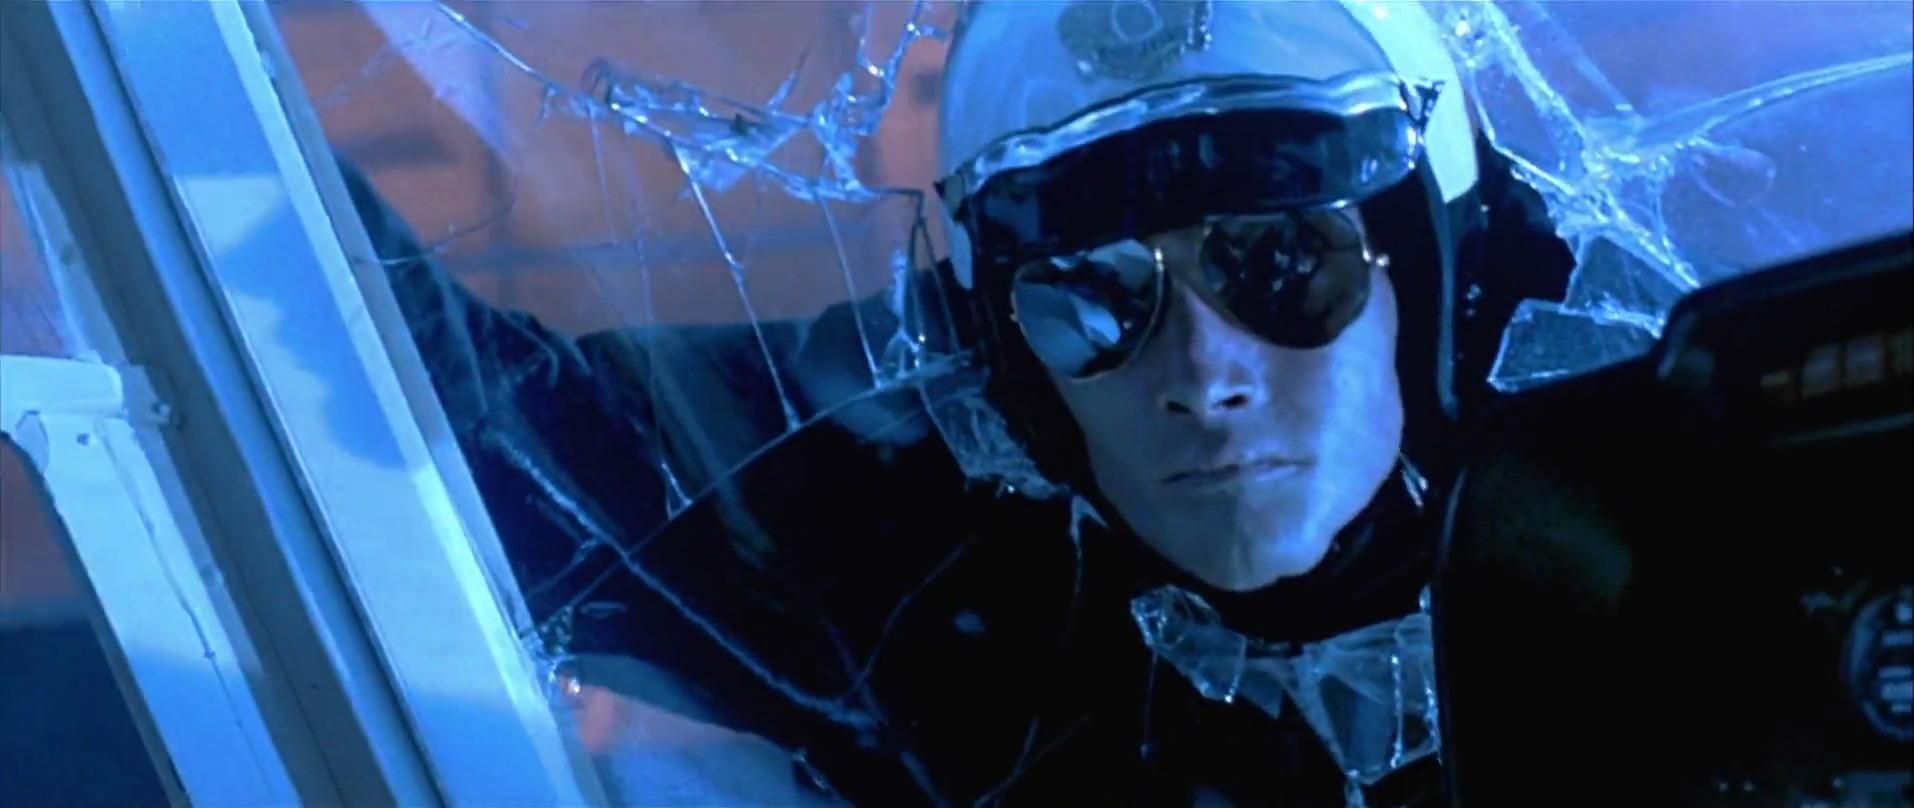 Terminator 2: Judgment Day Returning to TheatersReggie's ...